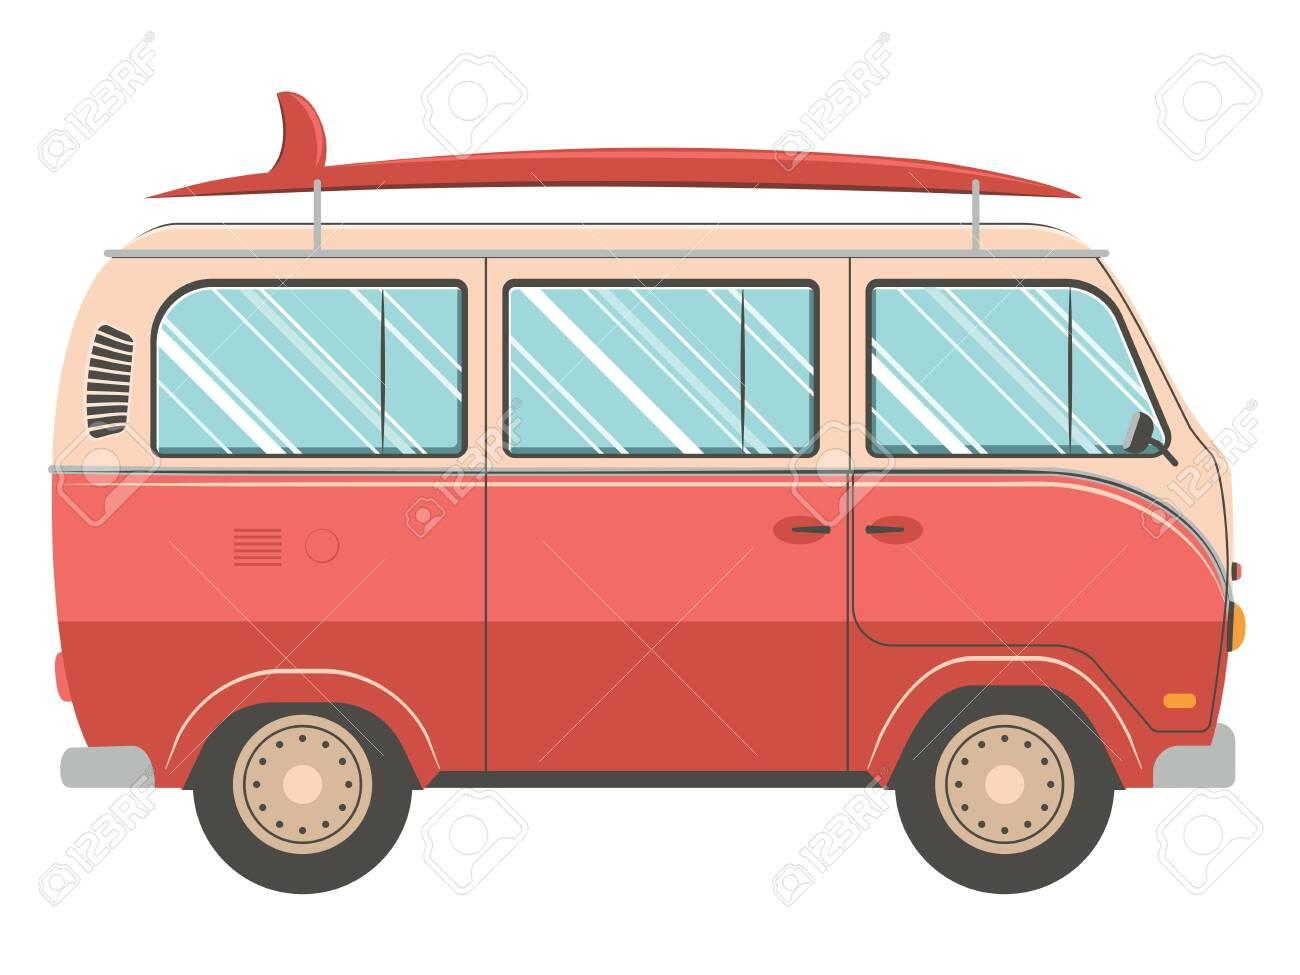 Illustration of retro traveling van design on white background. - 124075554